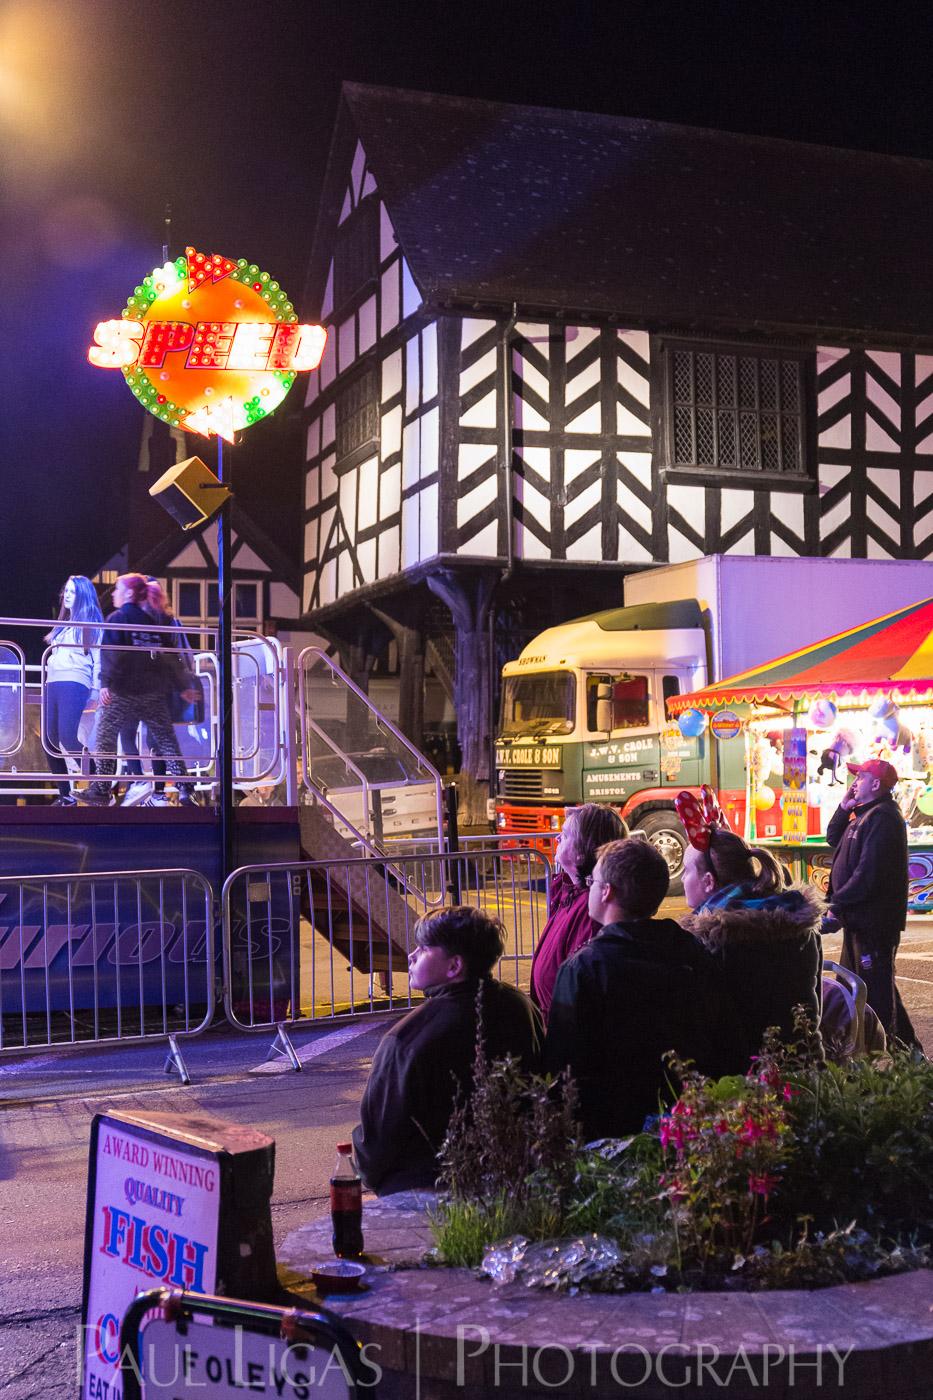 The Ledbury Fair, Herefordshire, people, street photographer photography event candid 2254